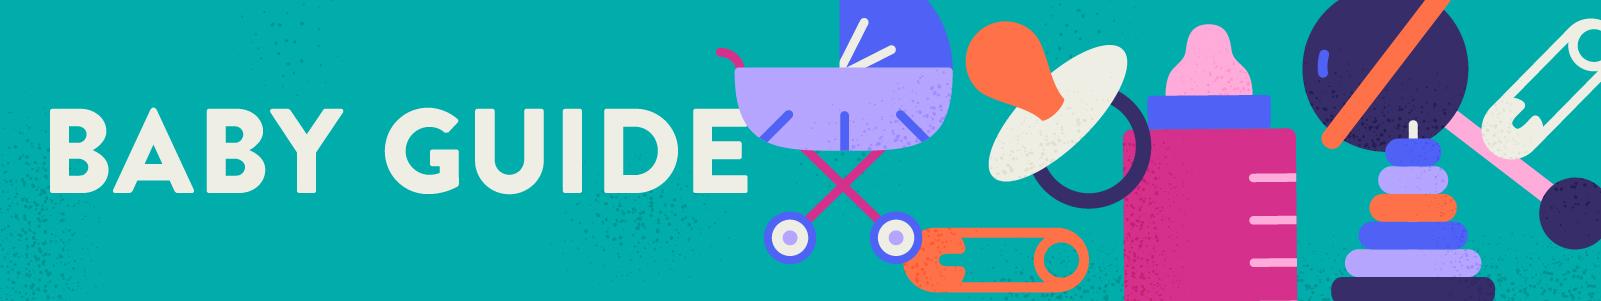 Baby Guide Header Narrow